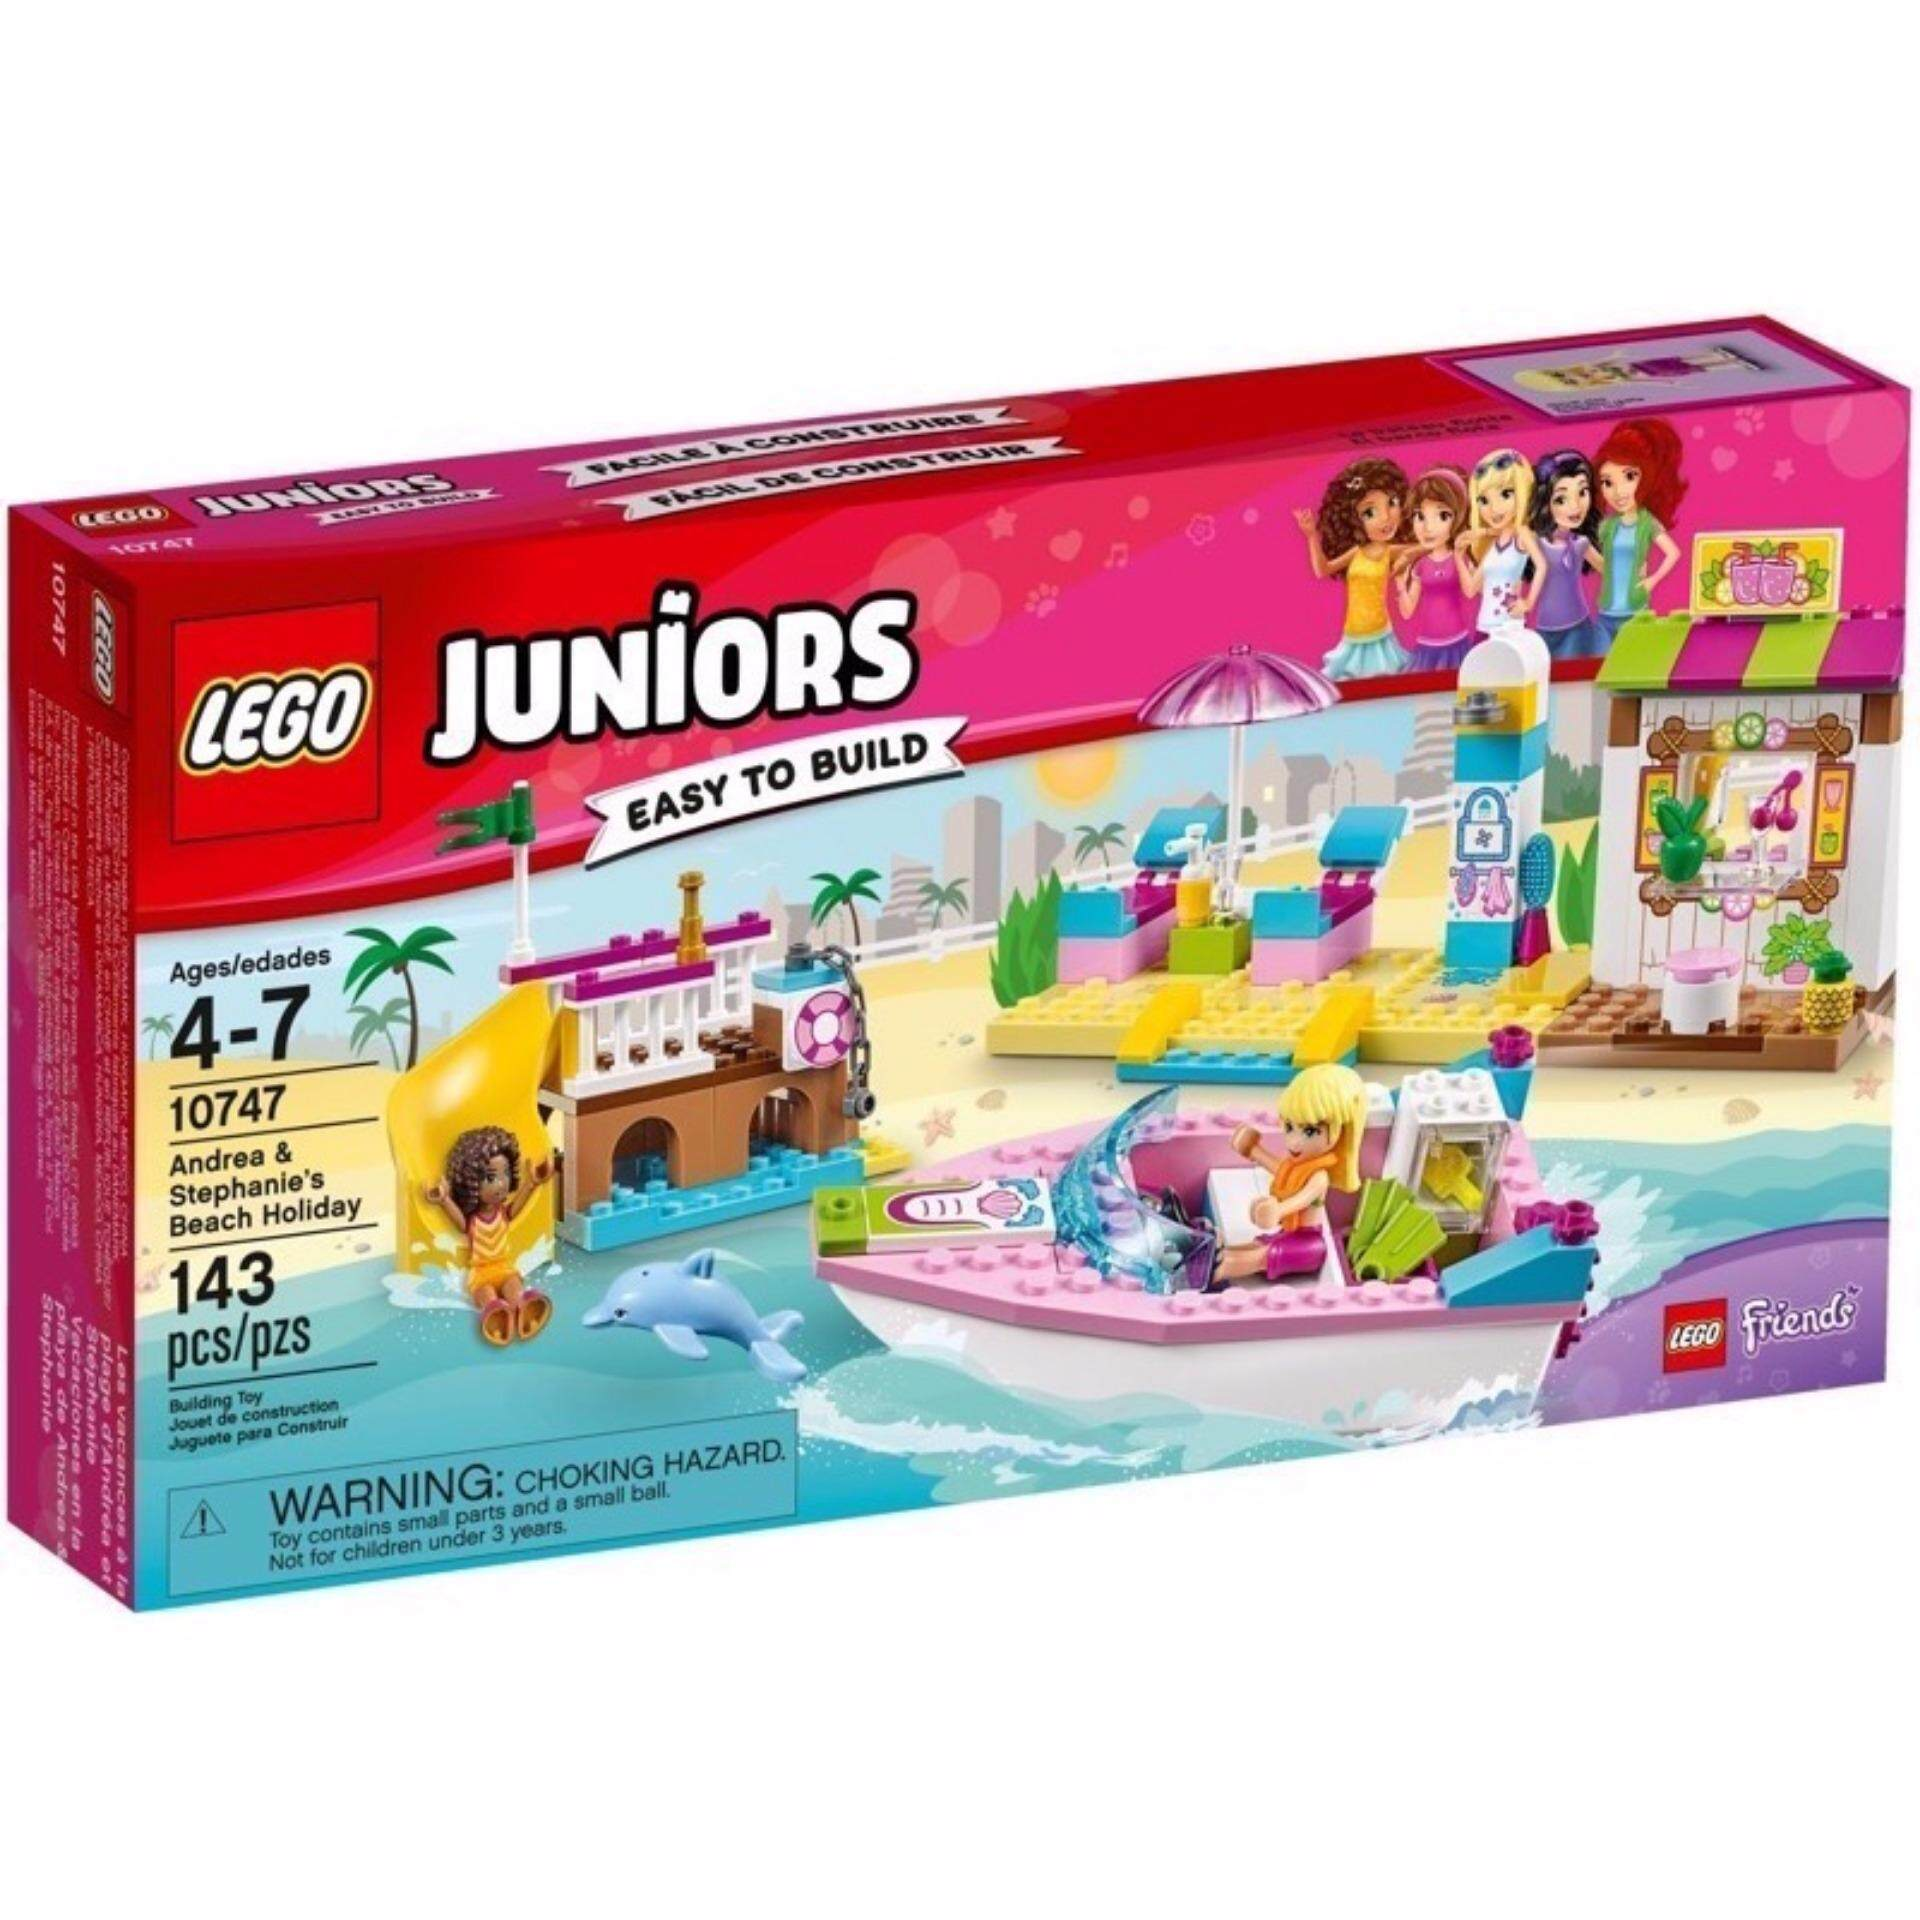 10747 Andreaamp; Stephanie's Holidayชุดตัวต่ Juniors Beach Lego VpzSUM